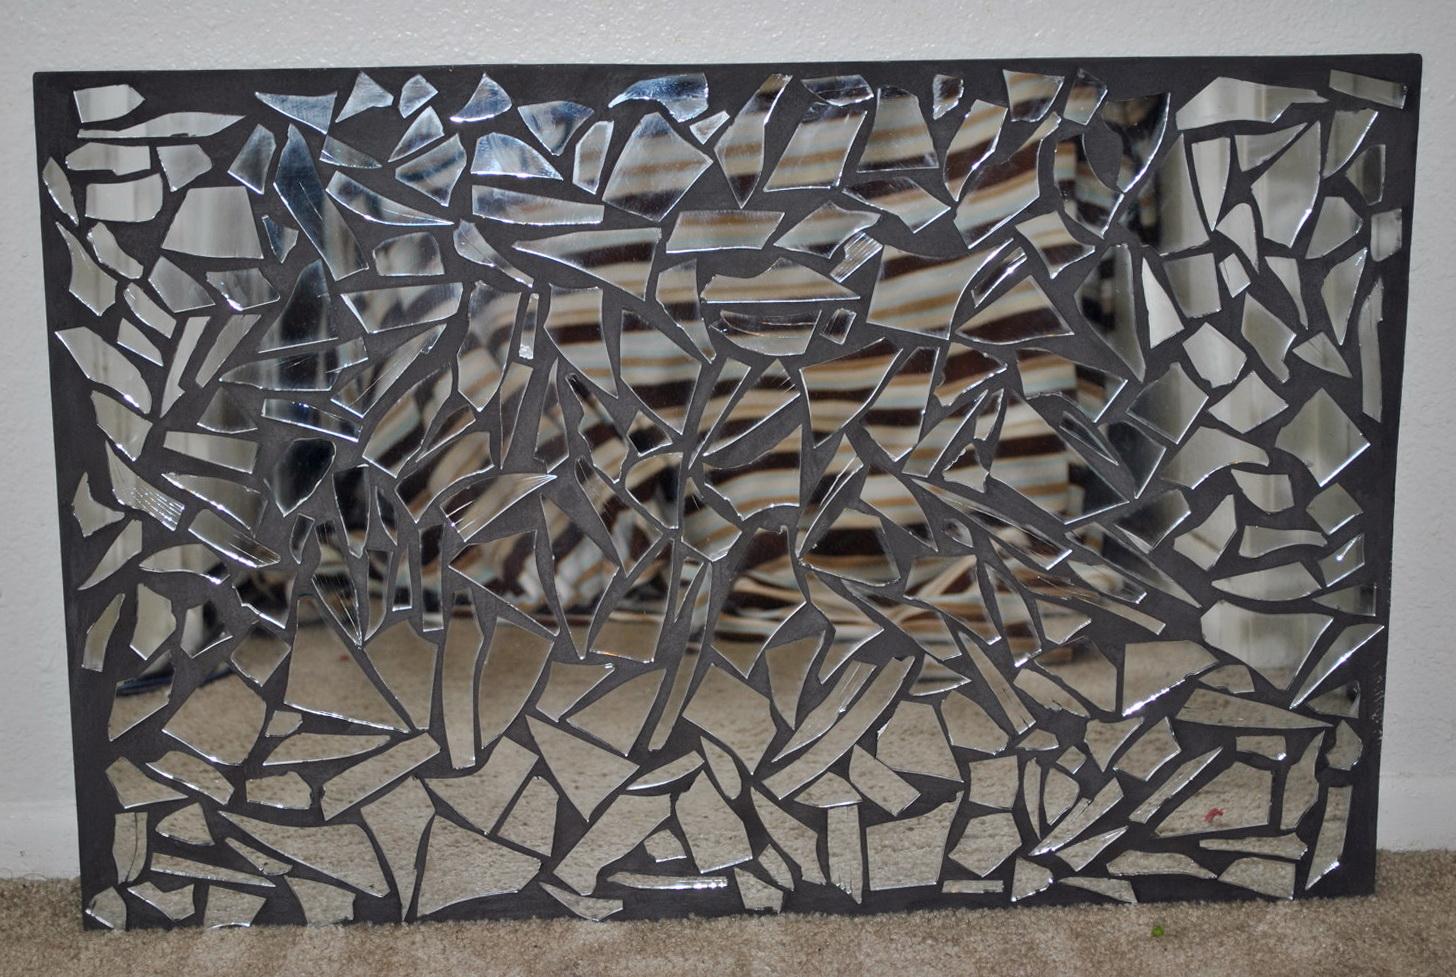 Wall Stickers Decor Modern Mirrored Mosaic Wall Art Home Design Ideas